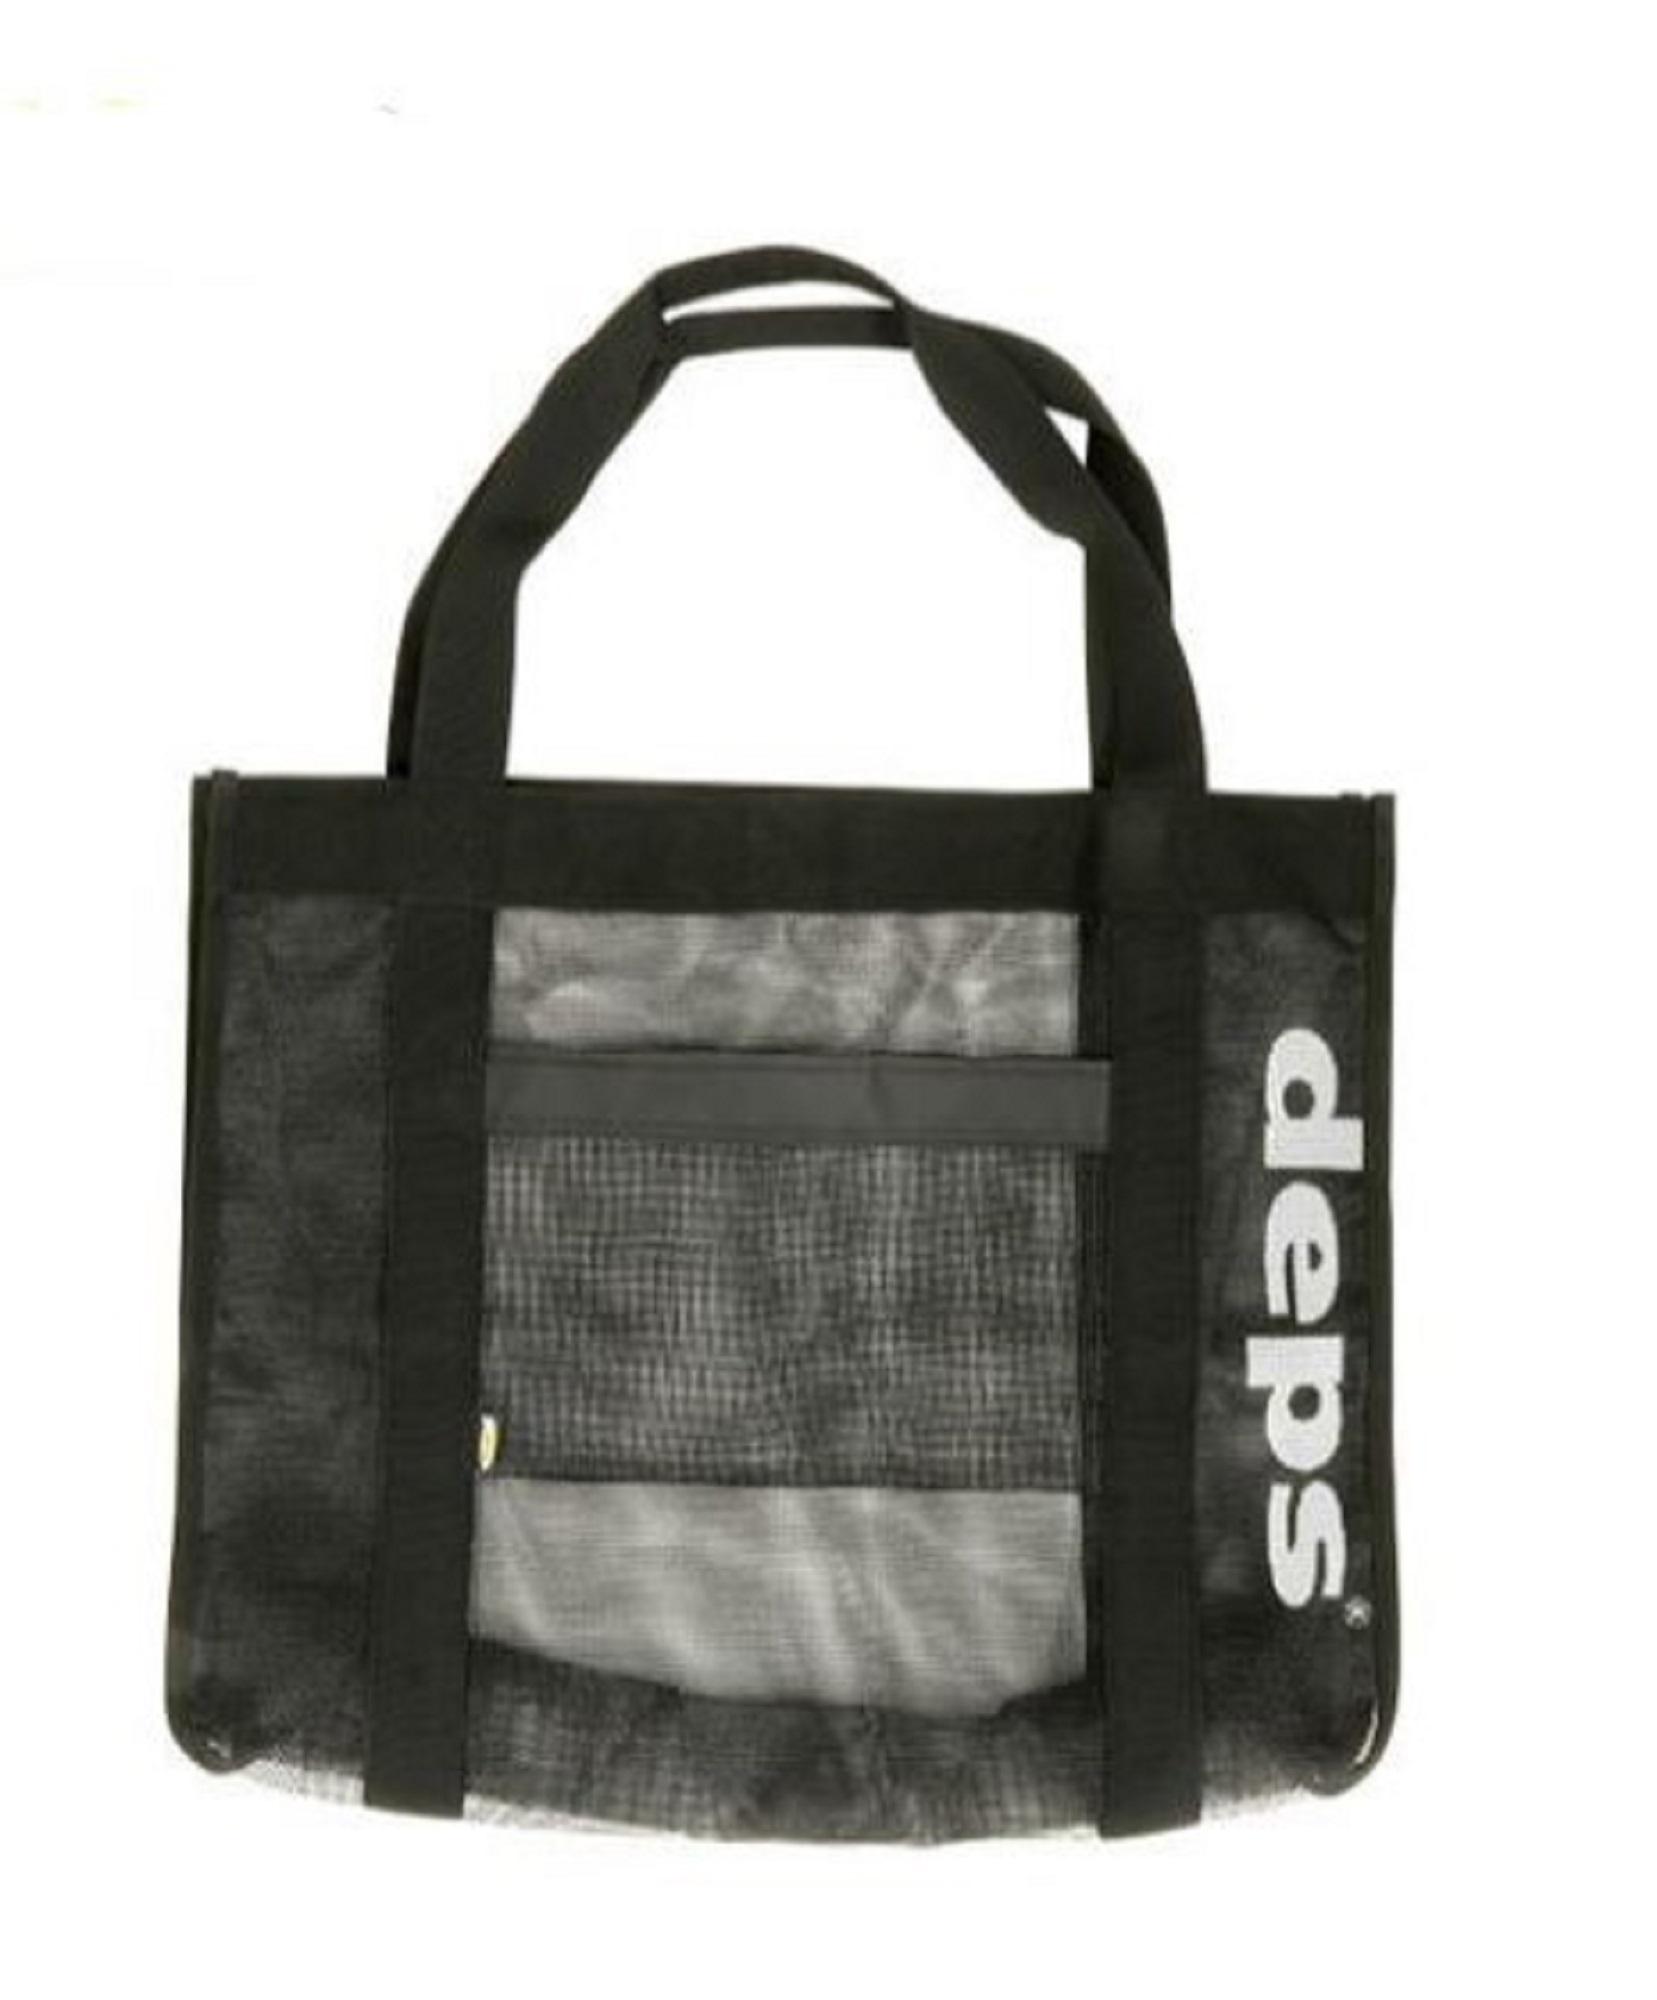 Deps Mesh Bag Size M 400 x 500 x 225 mm Black (4586)